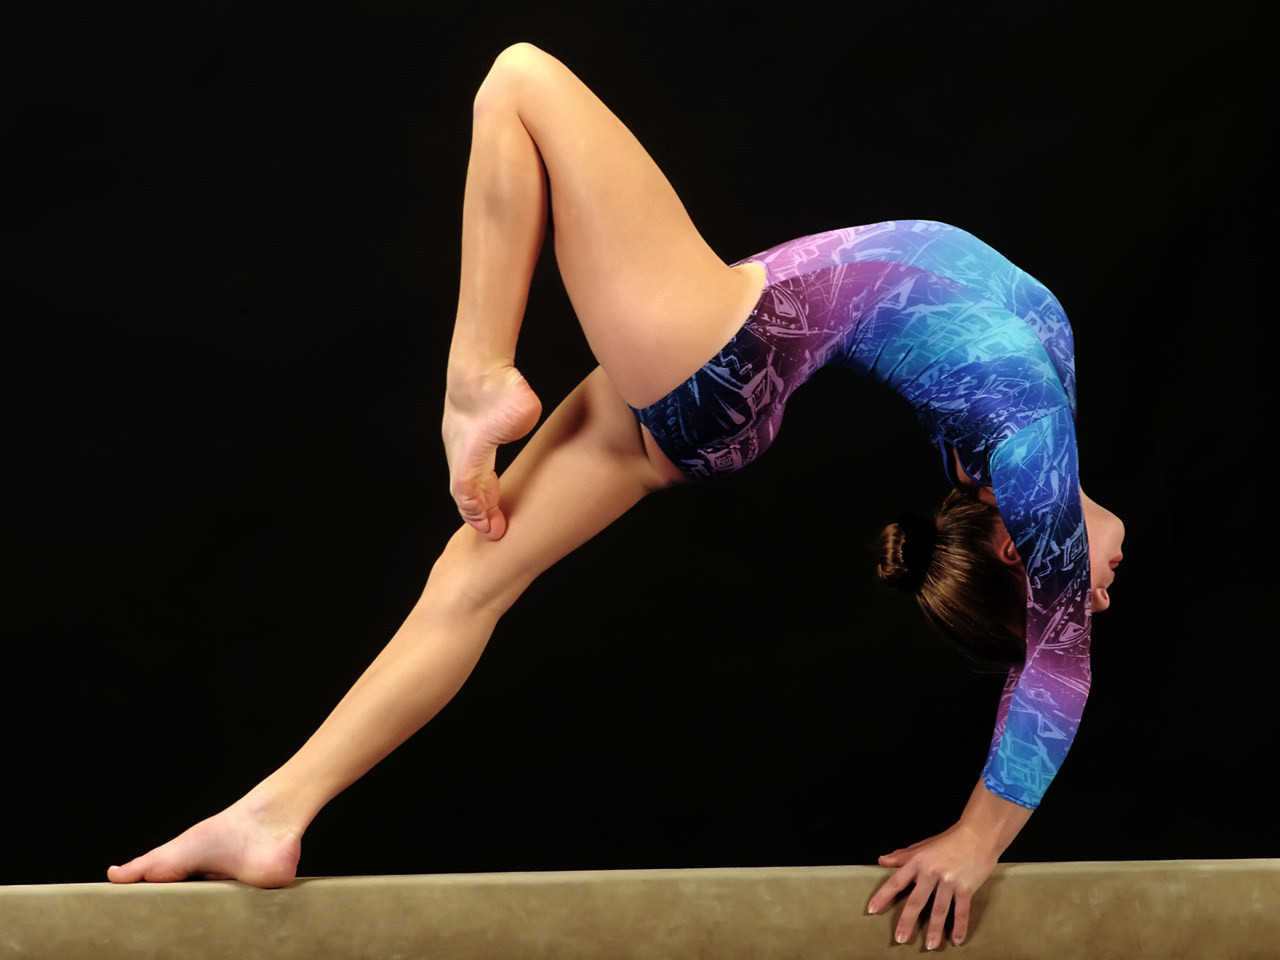 Girl On Gymnastics Beam